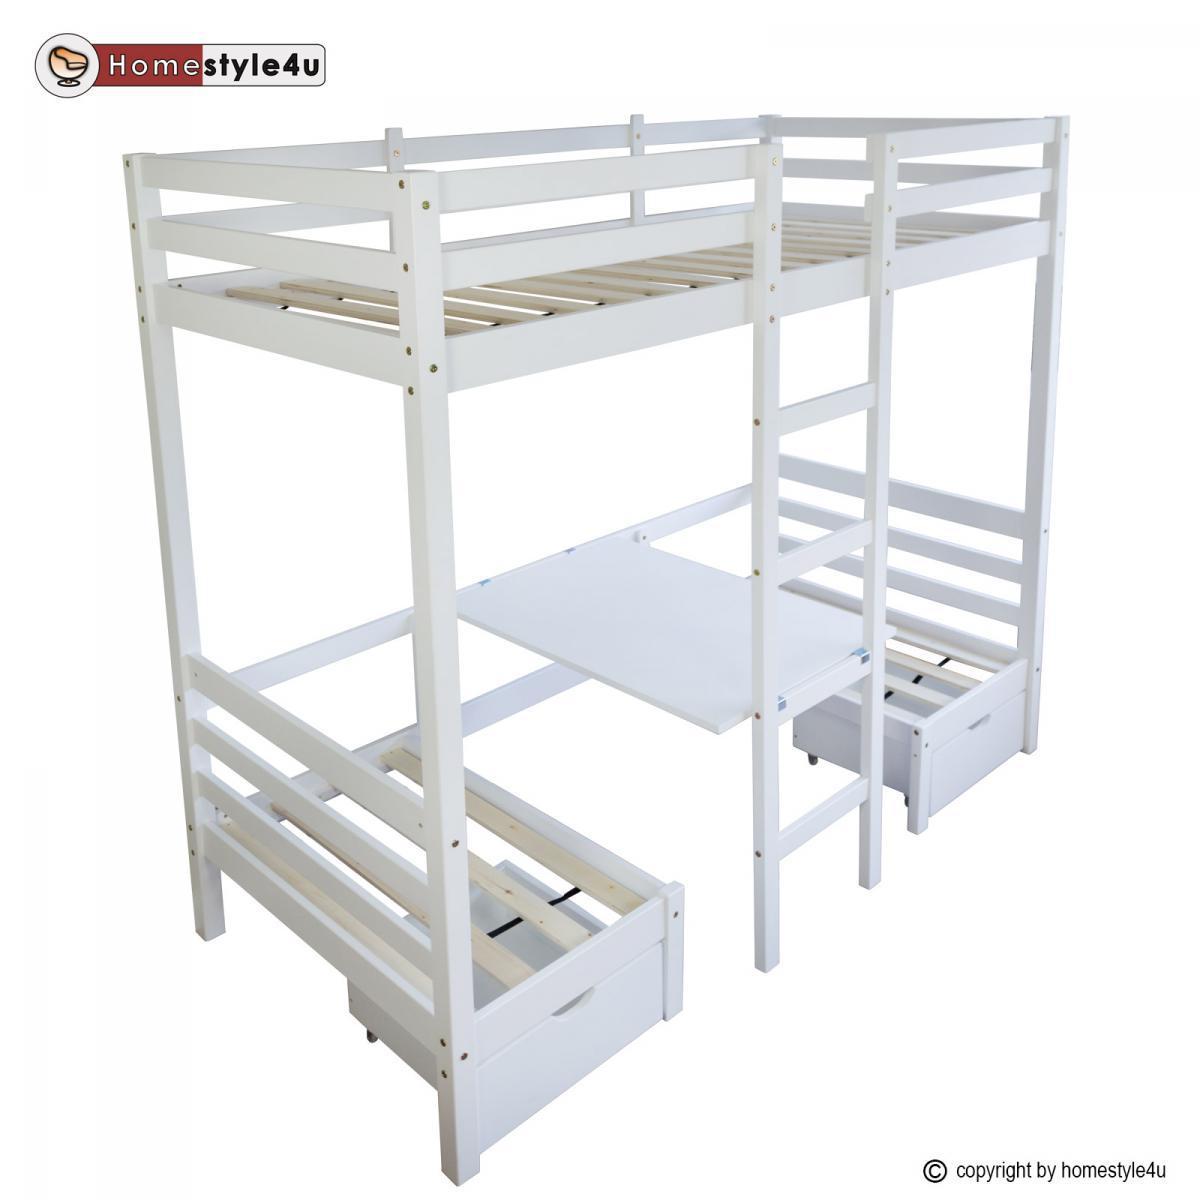 Homestyle4U Lit enfant mezzanine superposé blanc 90x200 pin massif bureau